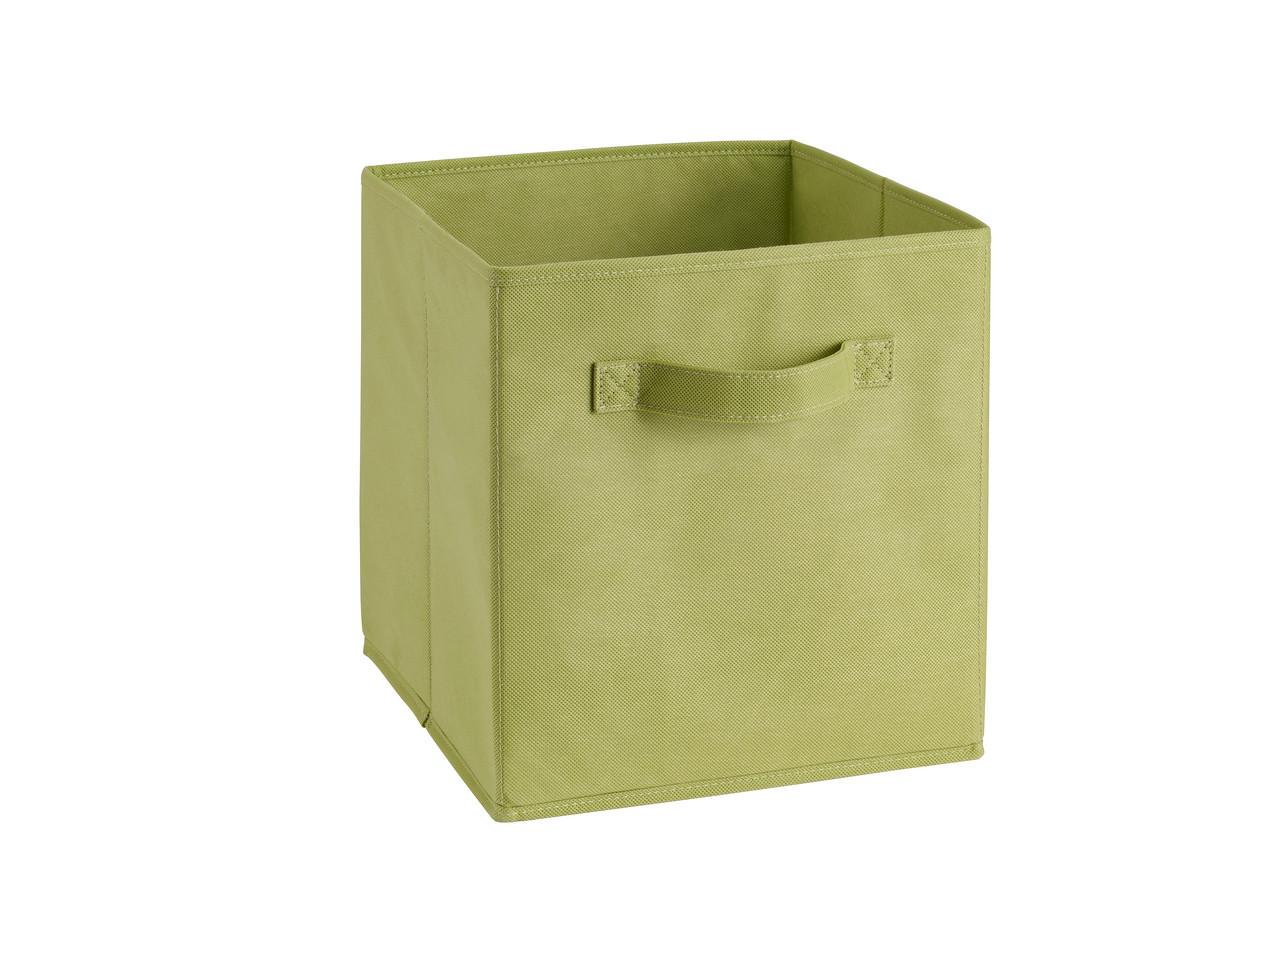 ClosetMaid Cubeicals Fabric Drawer in Kiwi Green